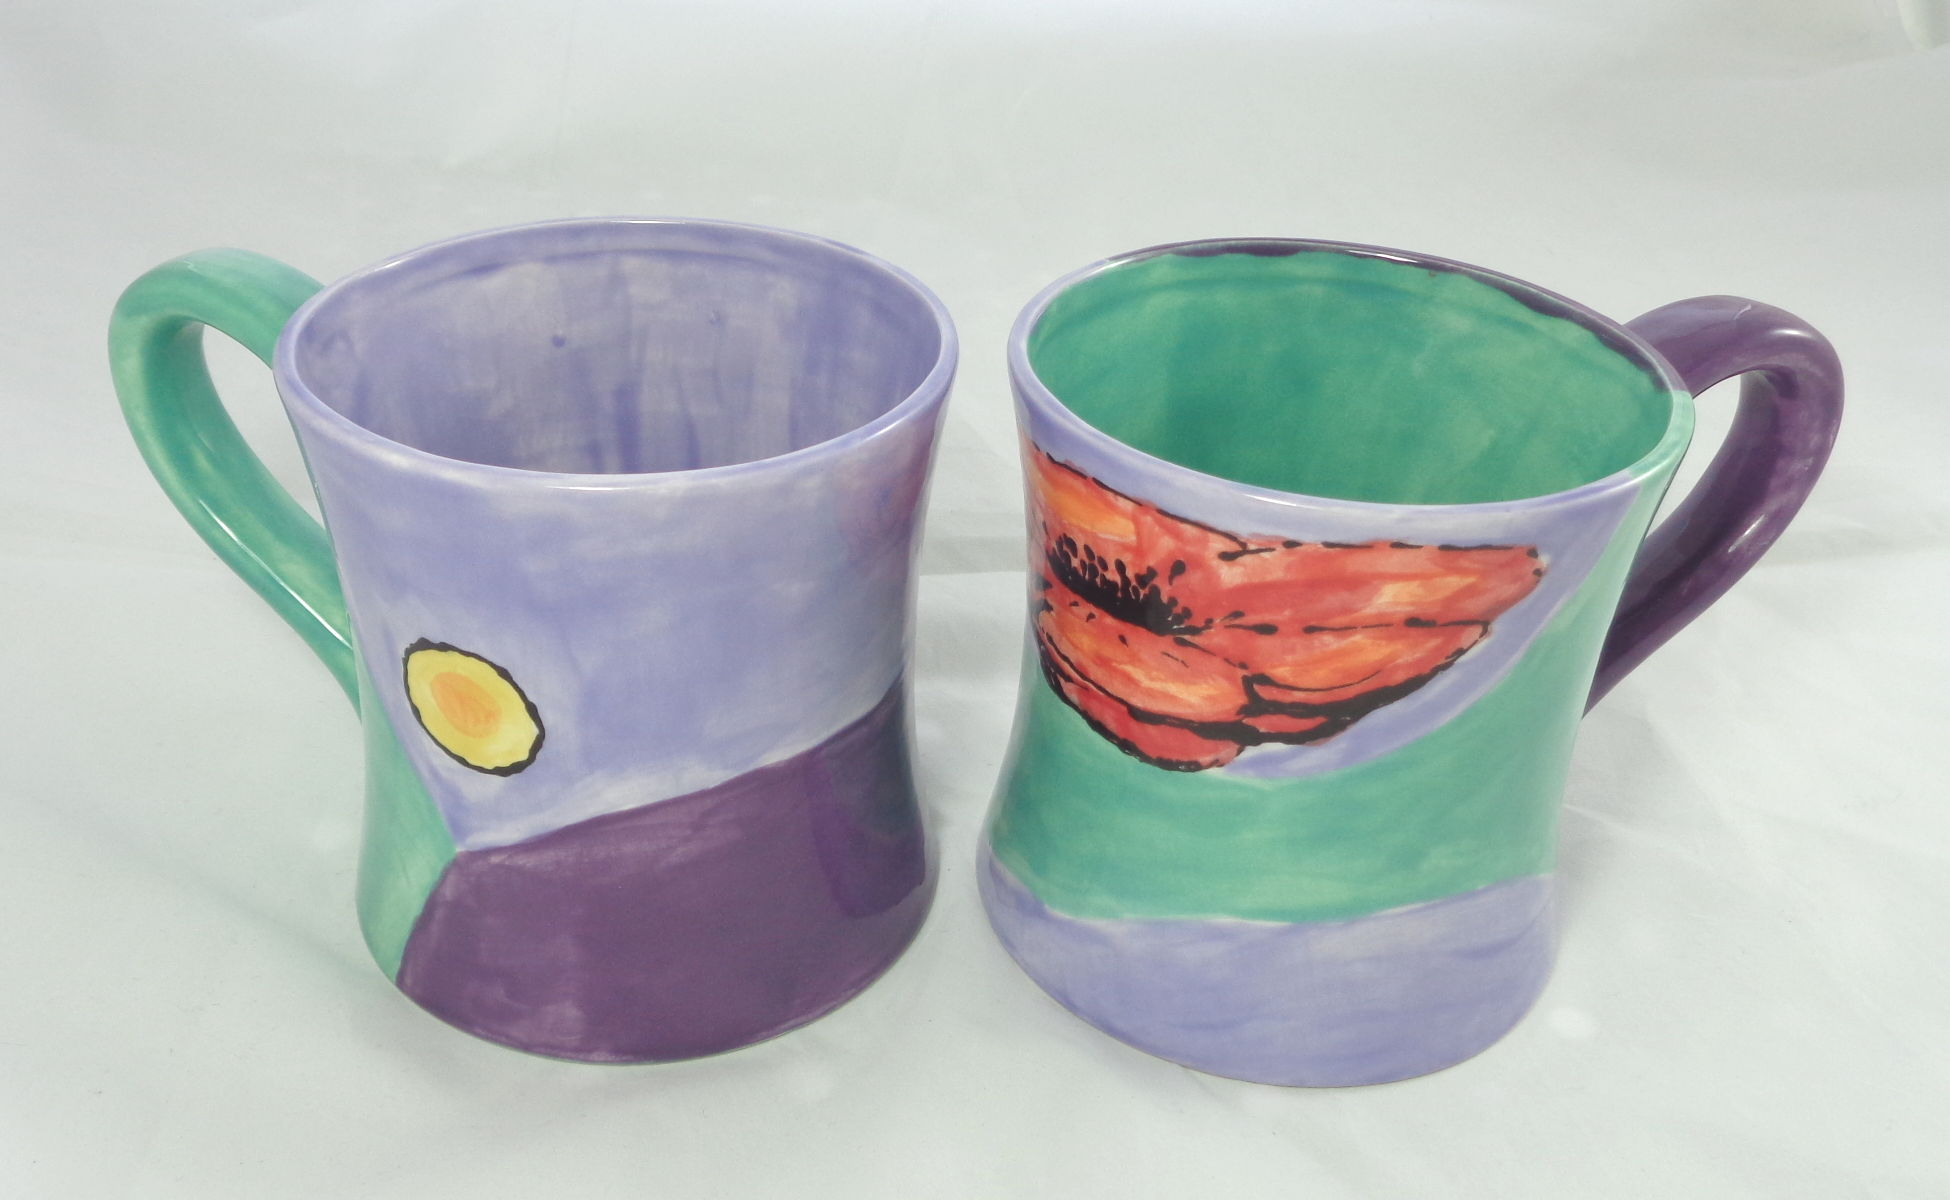 Bemalte Keramik Kaffeebecher Mohn